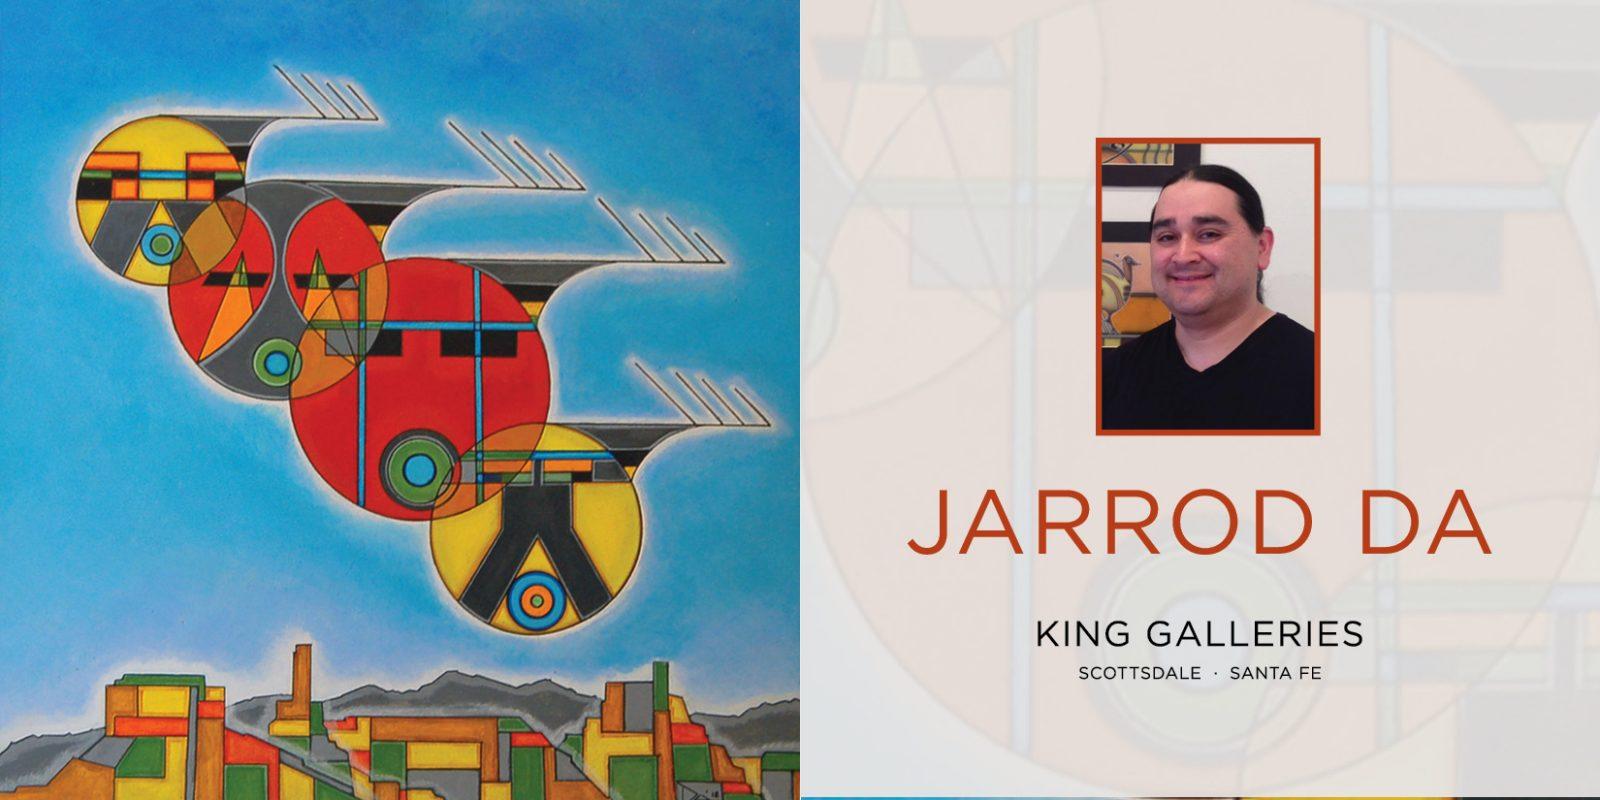 Jarrod Da